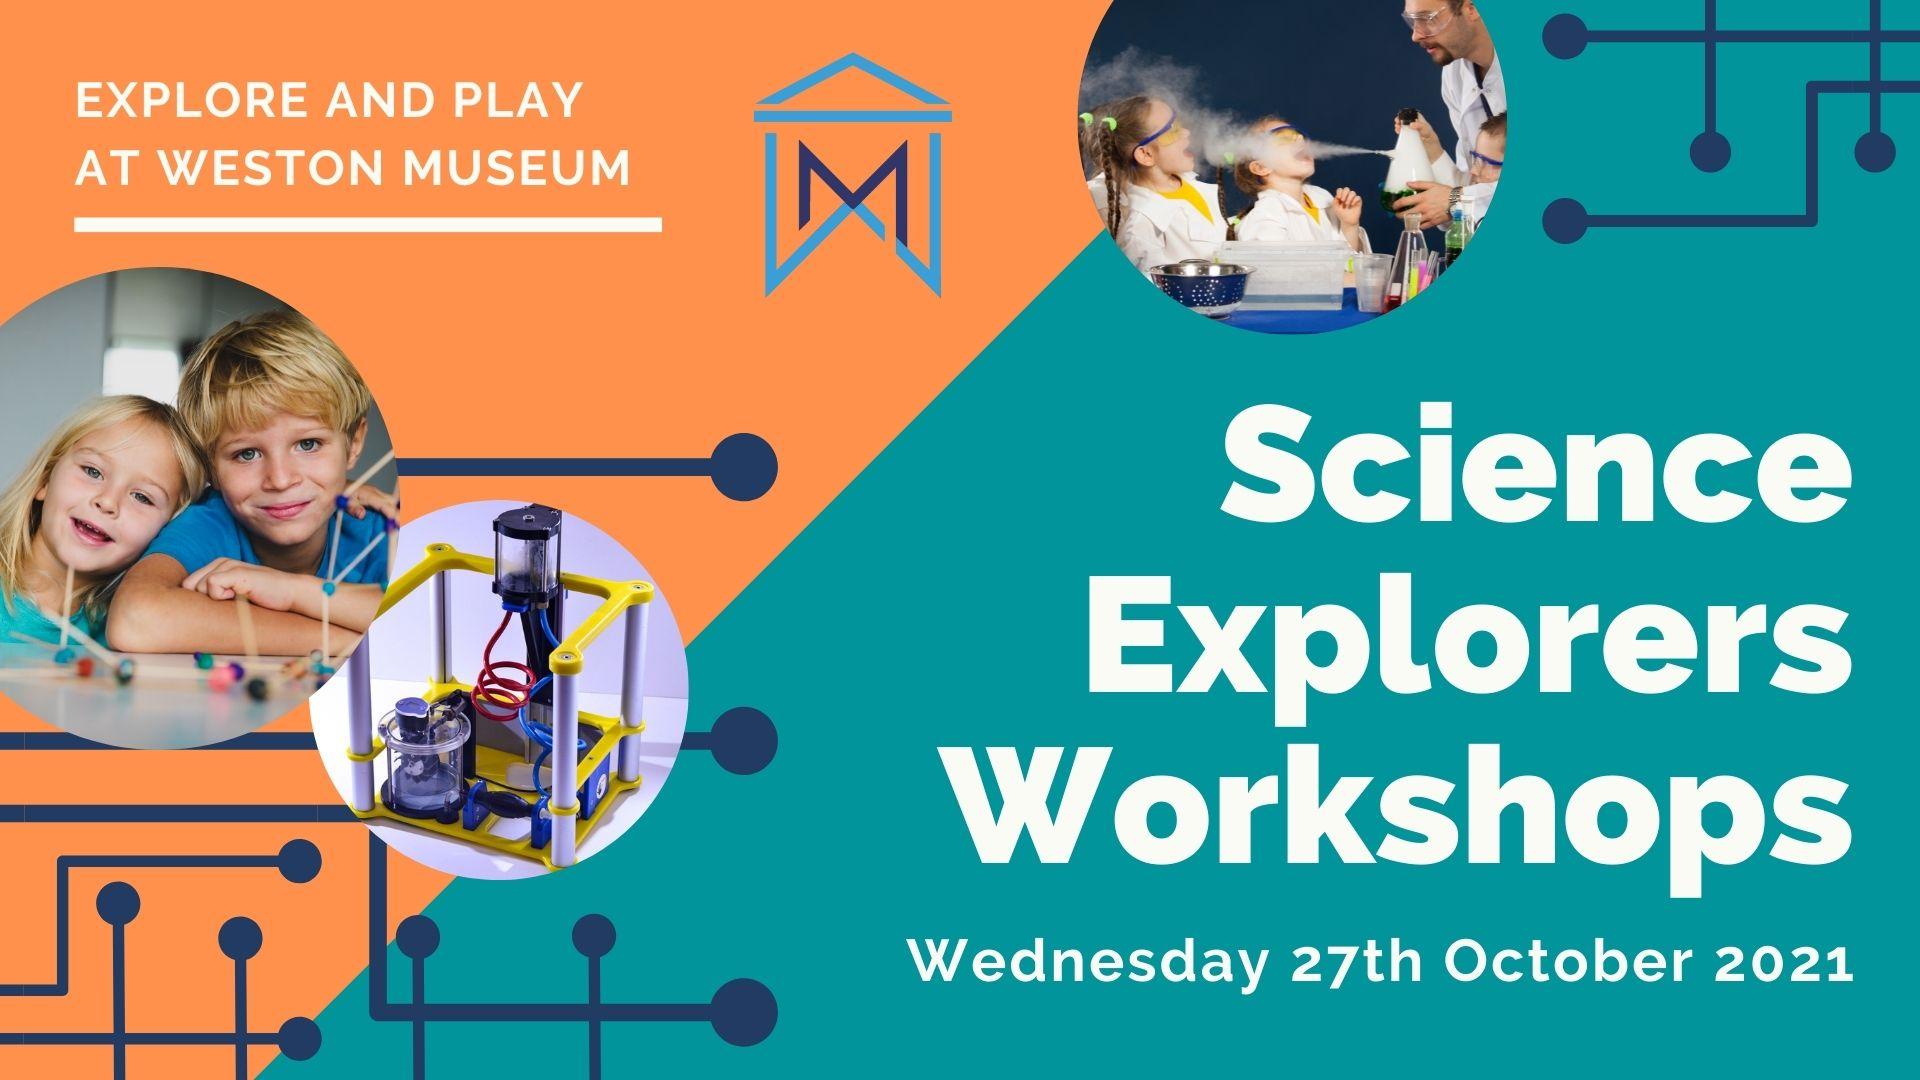 Event poster for Science Explorers Workshop